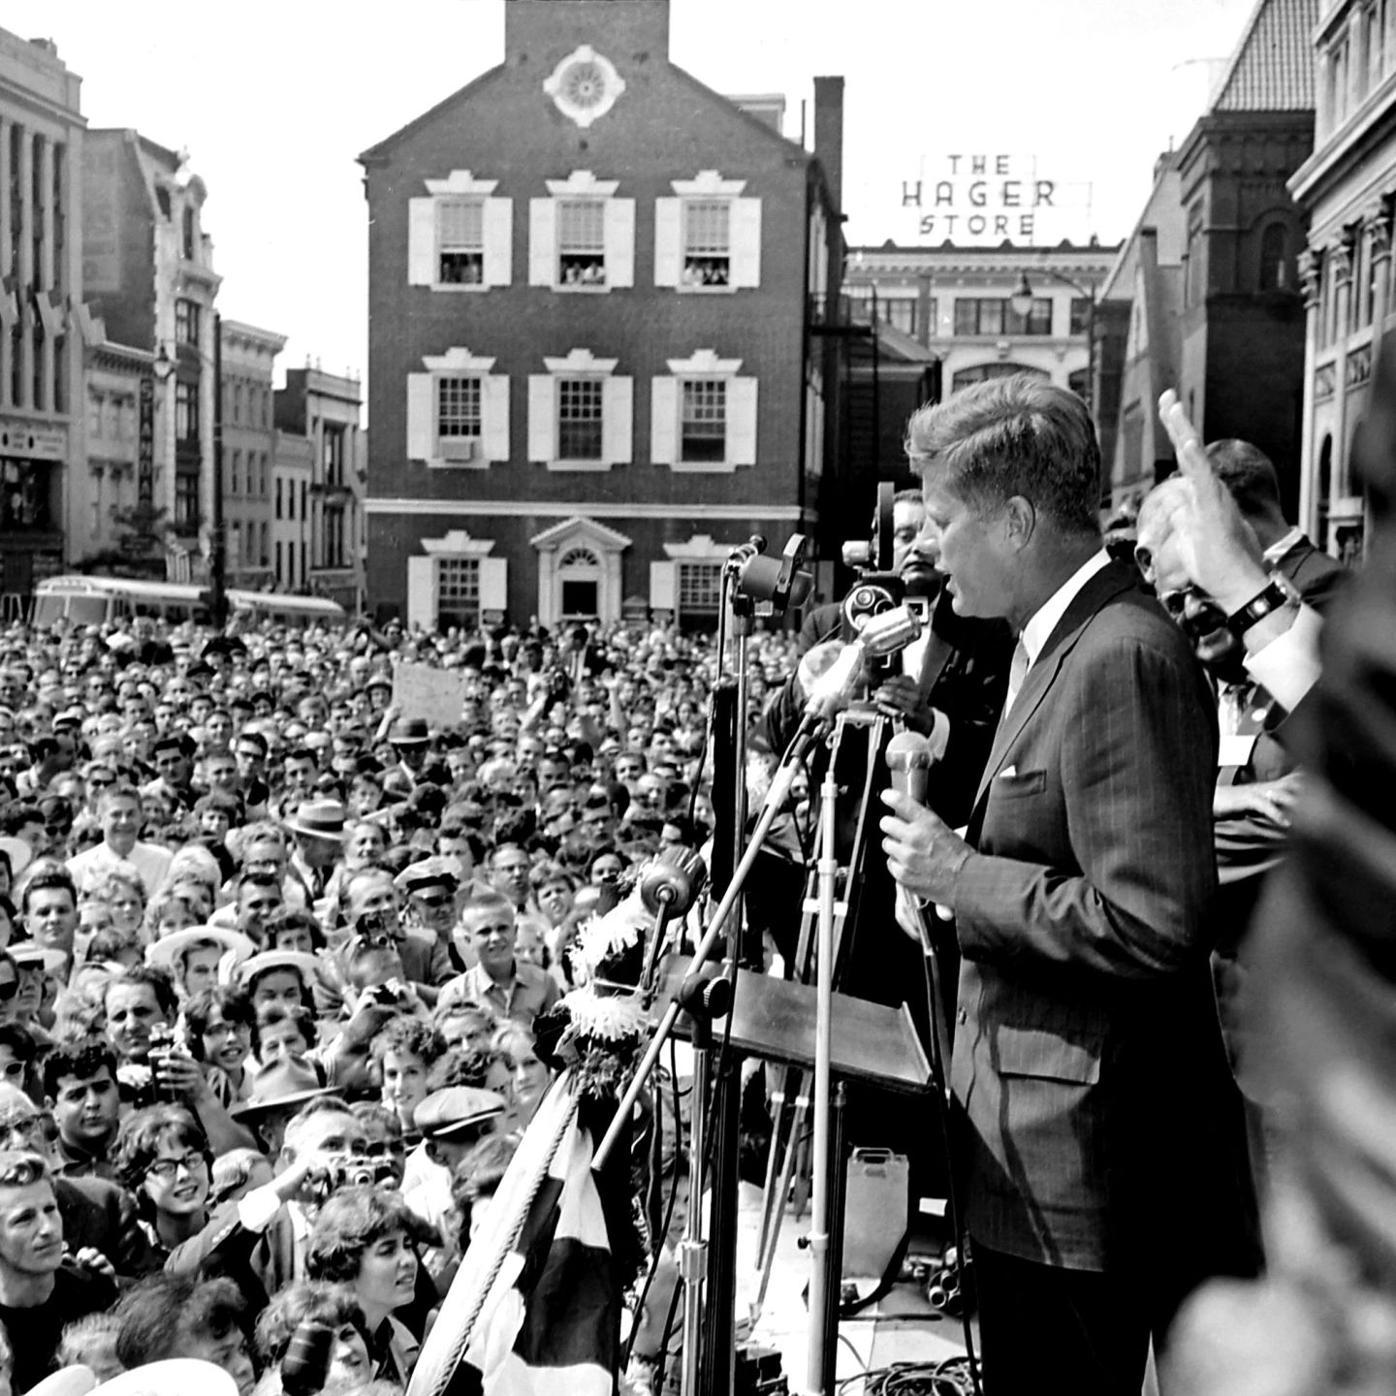 Through the viewfinder inset: JFK